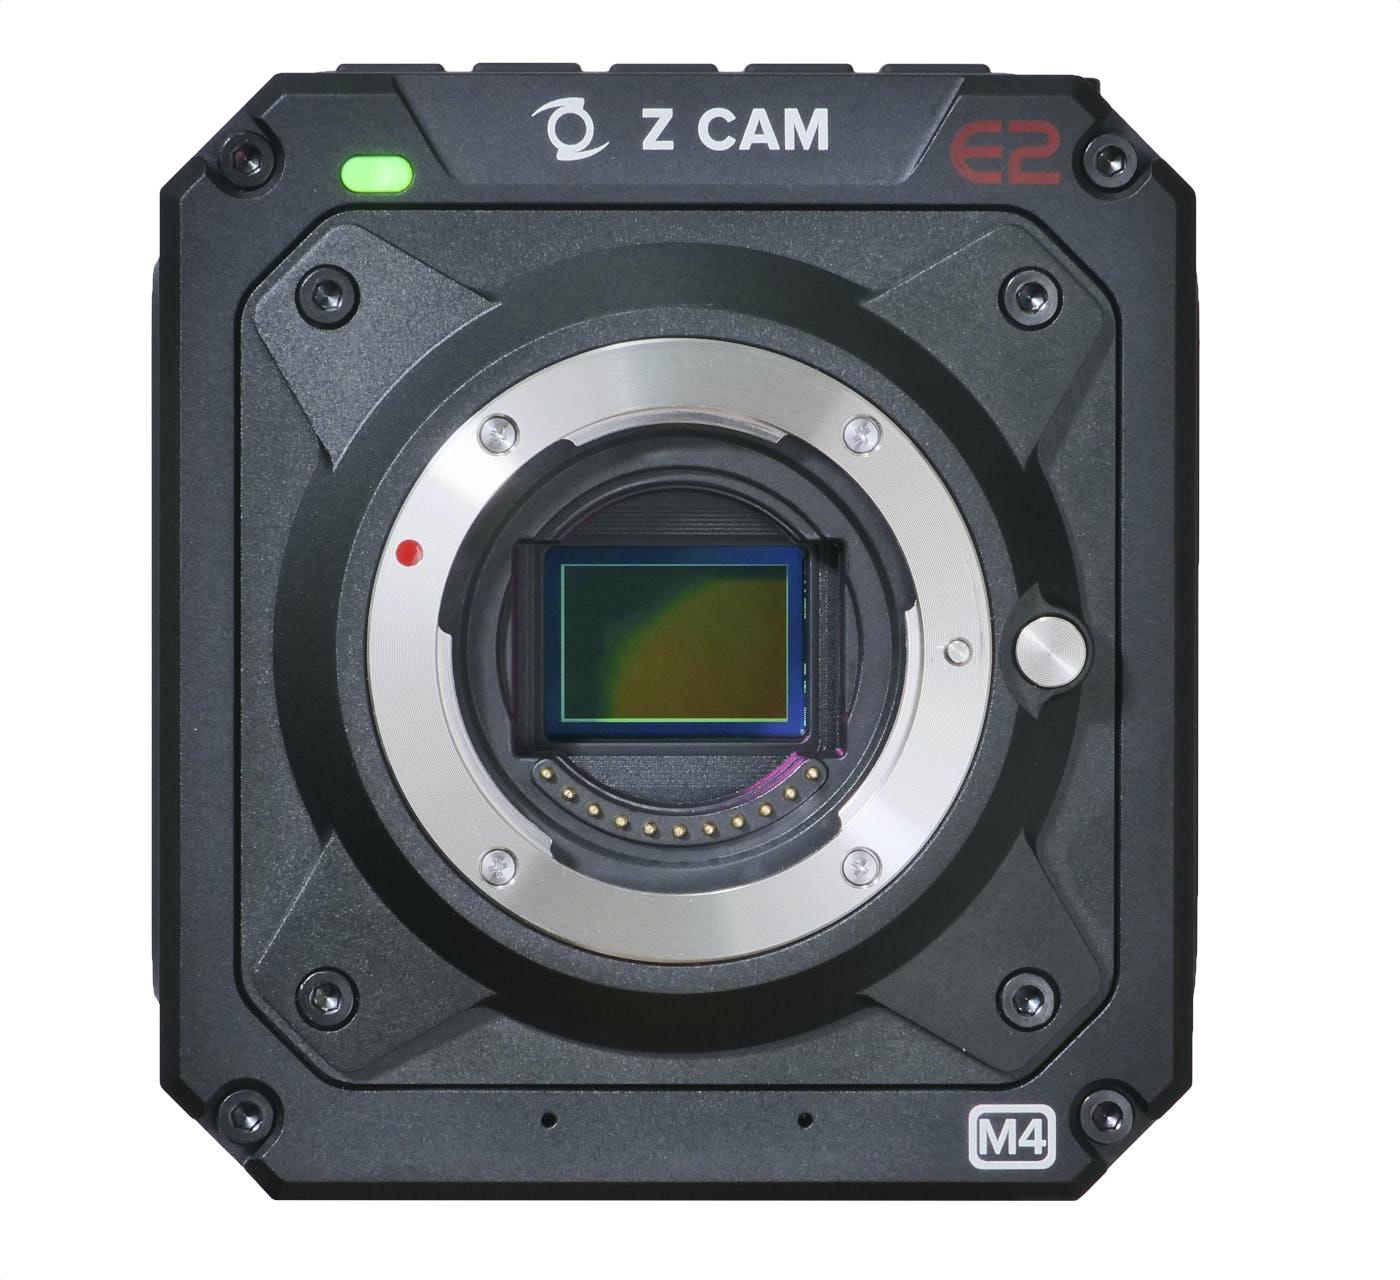 Z Cam E2-M4, showing its 4/3 sensor